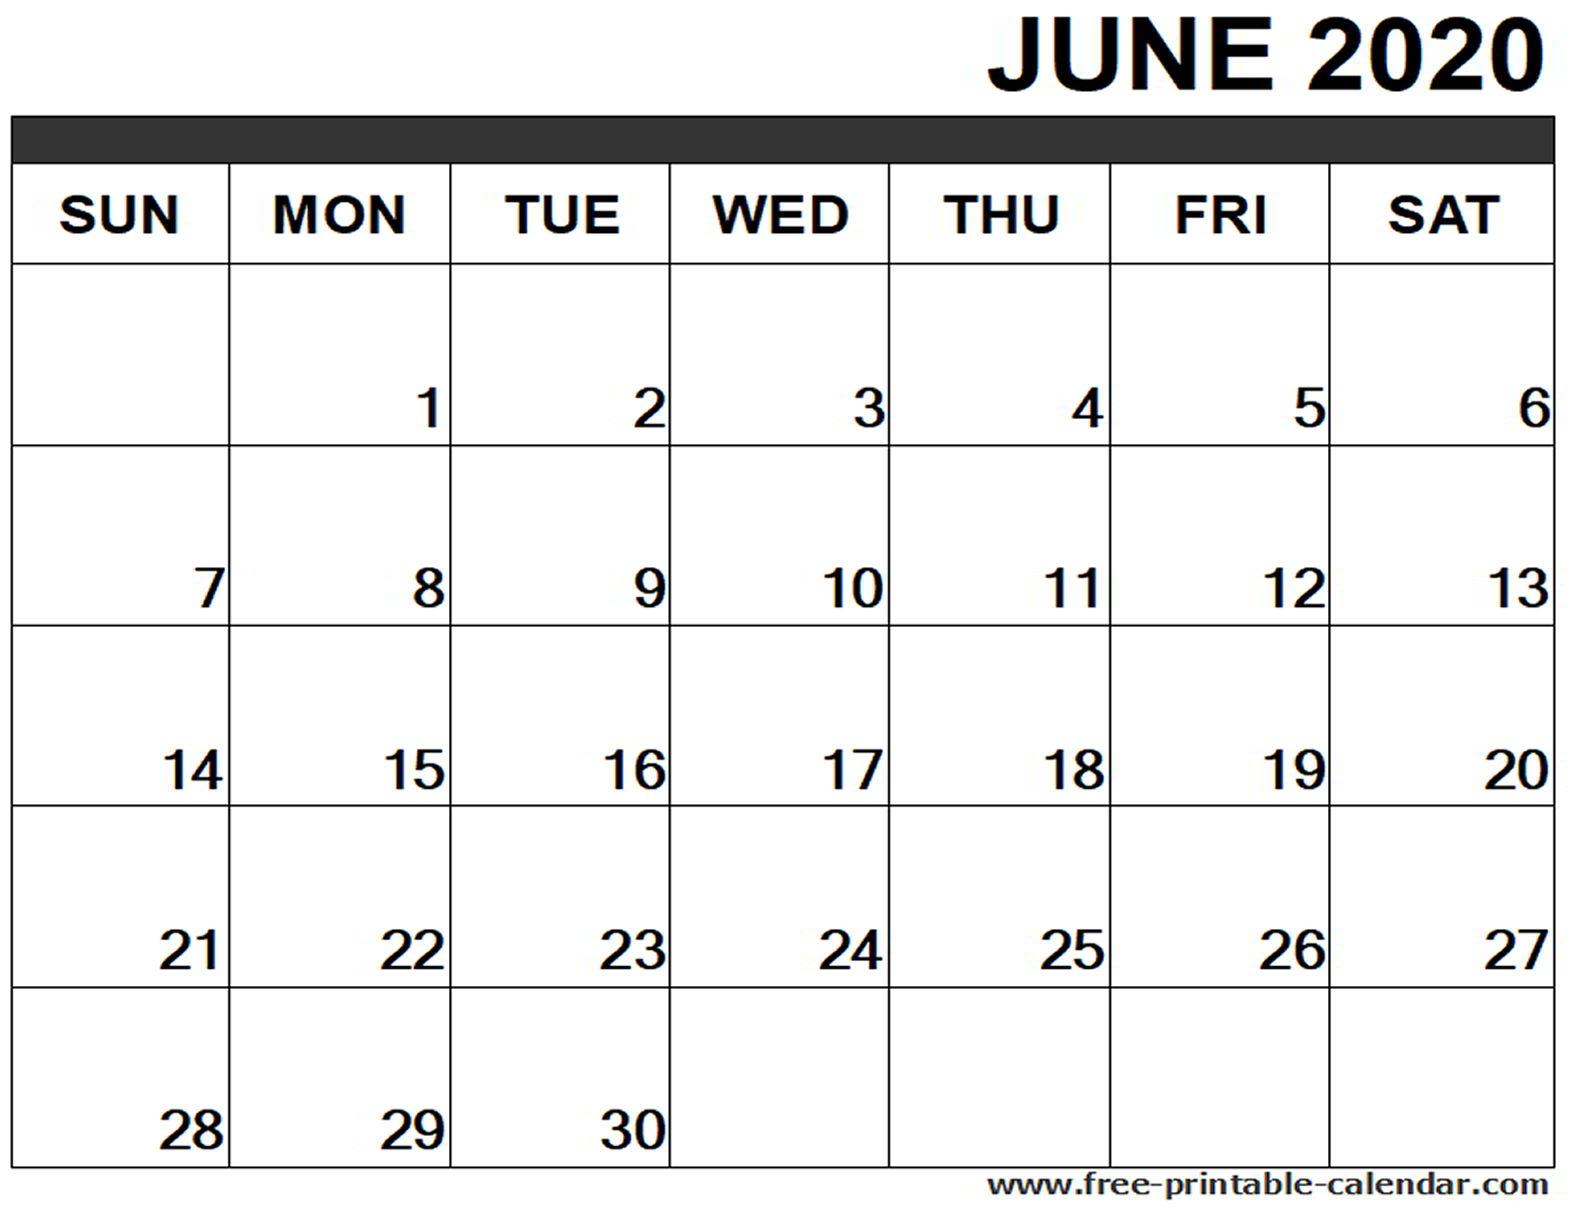 June 2020 Calendar Printable - Free-Printable-Calendar